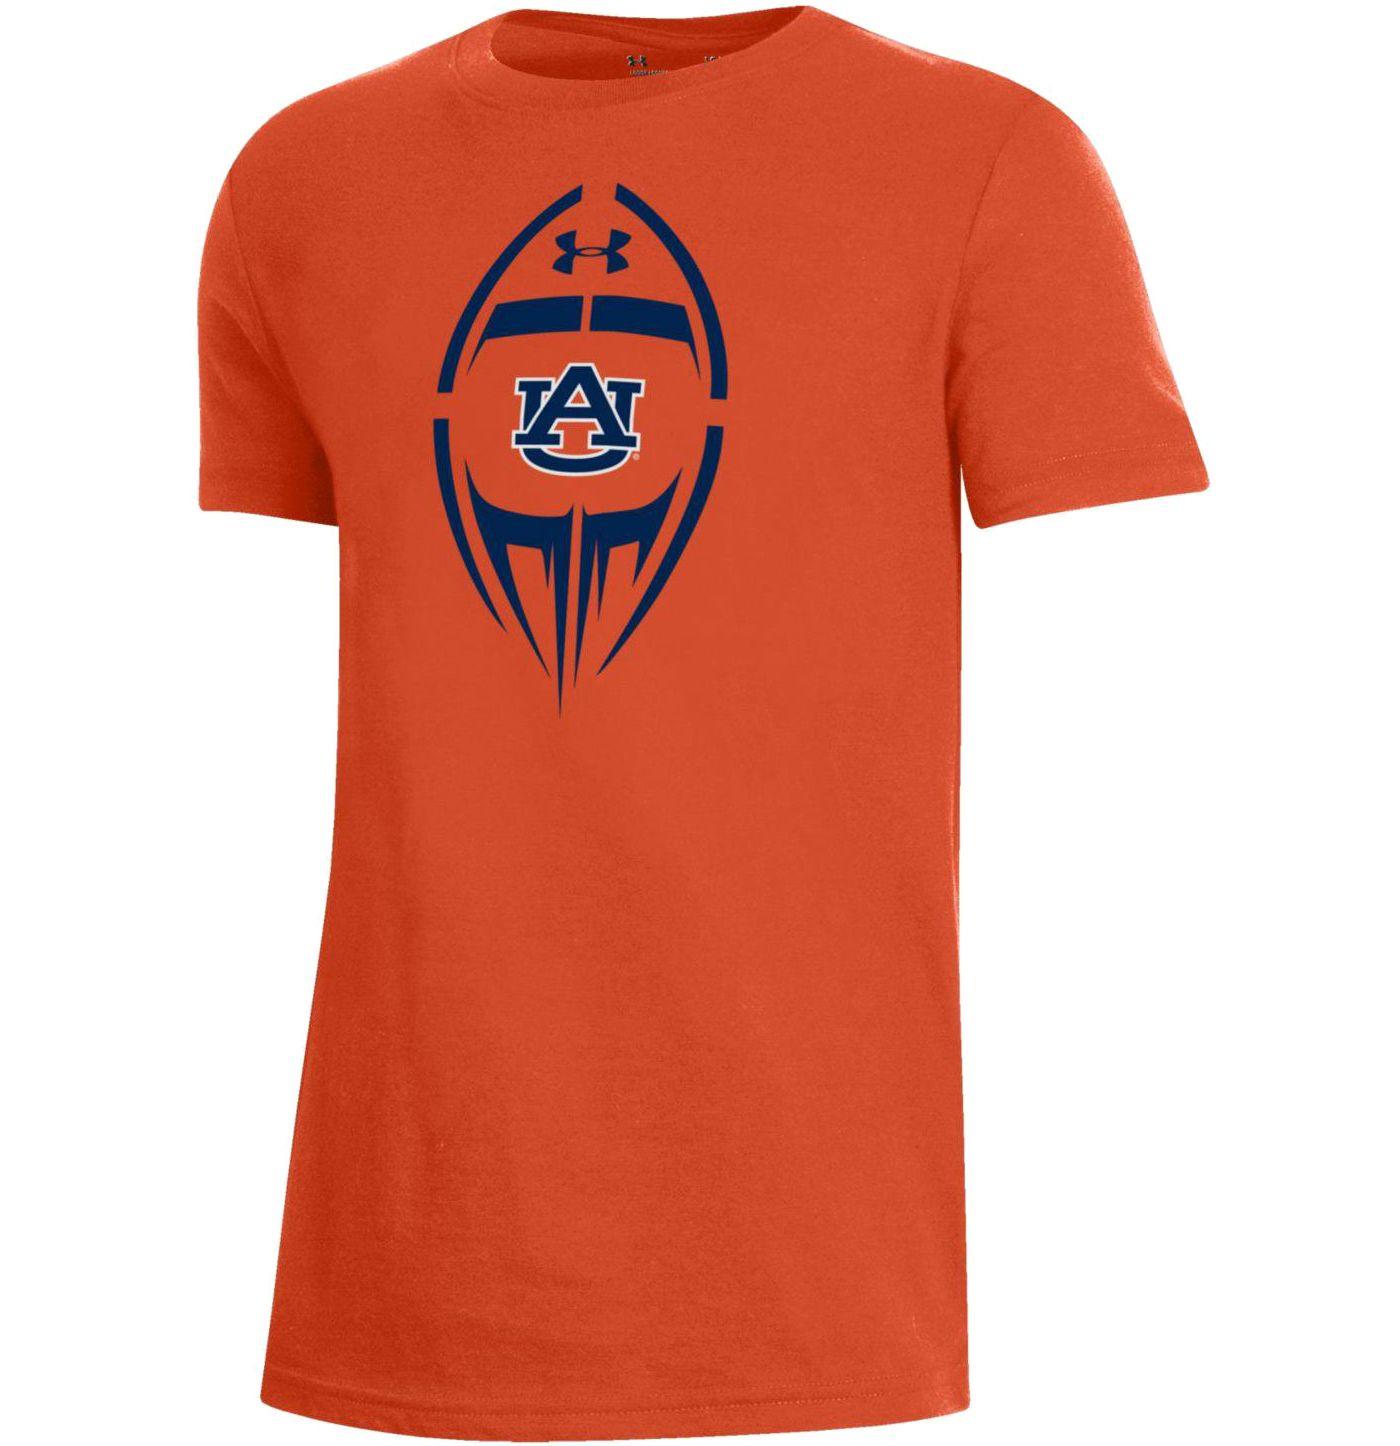 Under Armour Youth Auburn Tigers Orange Performance Cotton Football T-Shirt